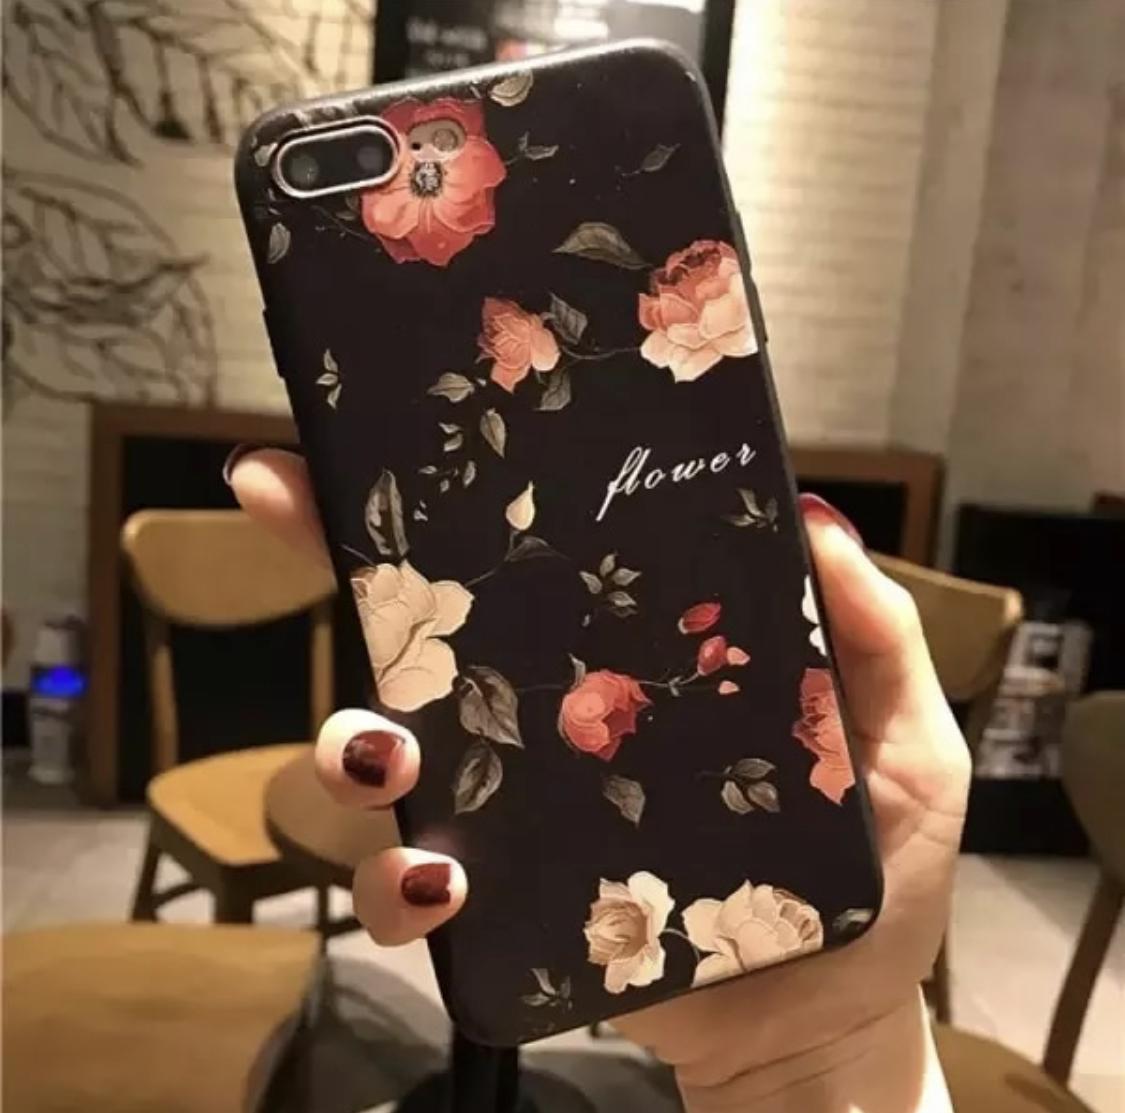 01906879a0 フラワーiPhoneケース 花柄 立体エンボス加工 ☆iPhone6/6s/6,6sPlus/7 ...